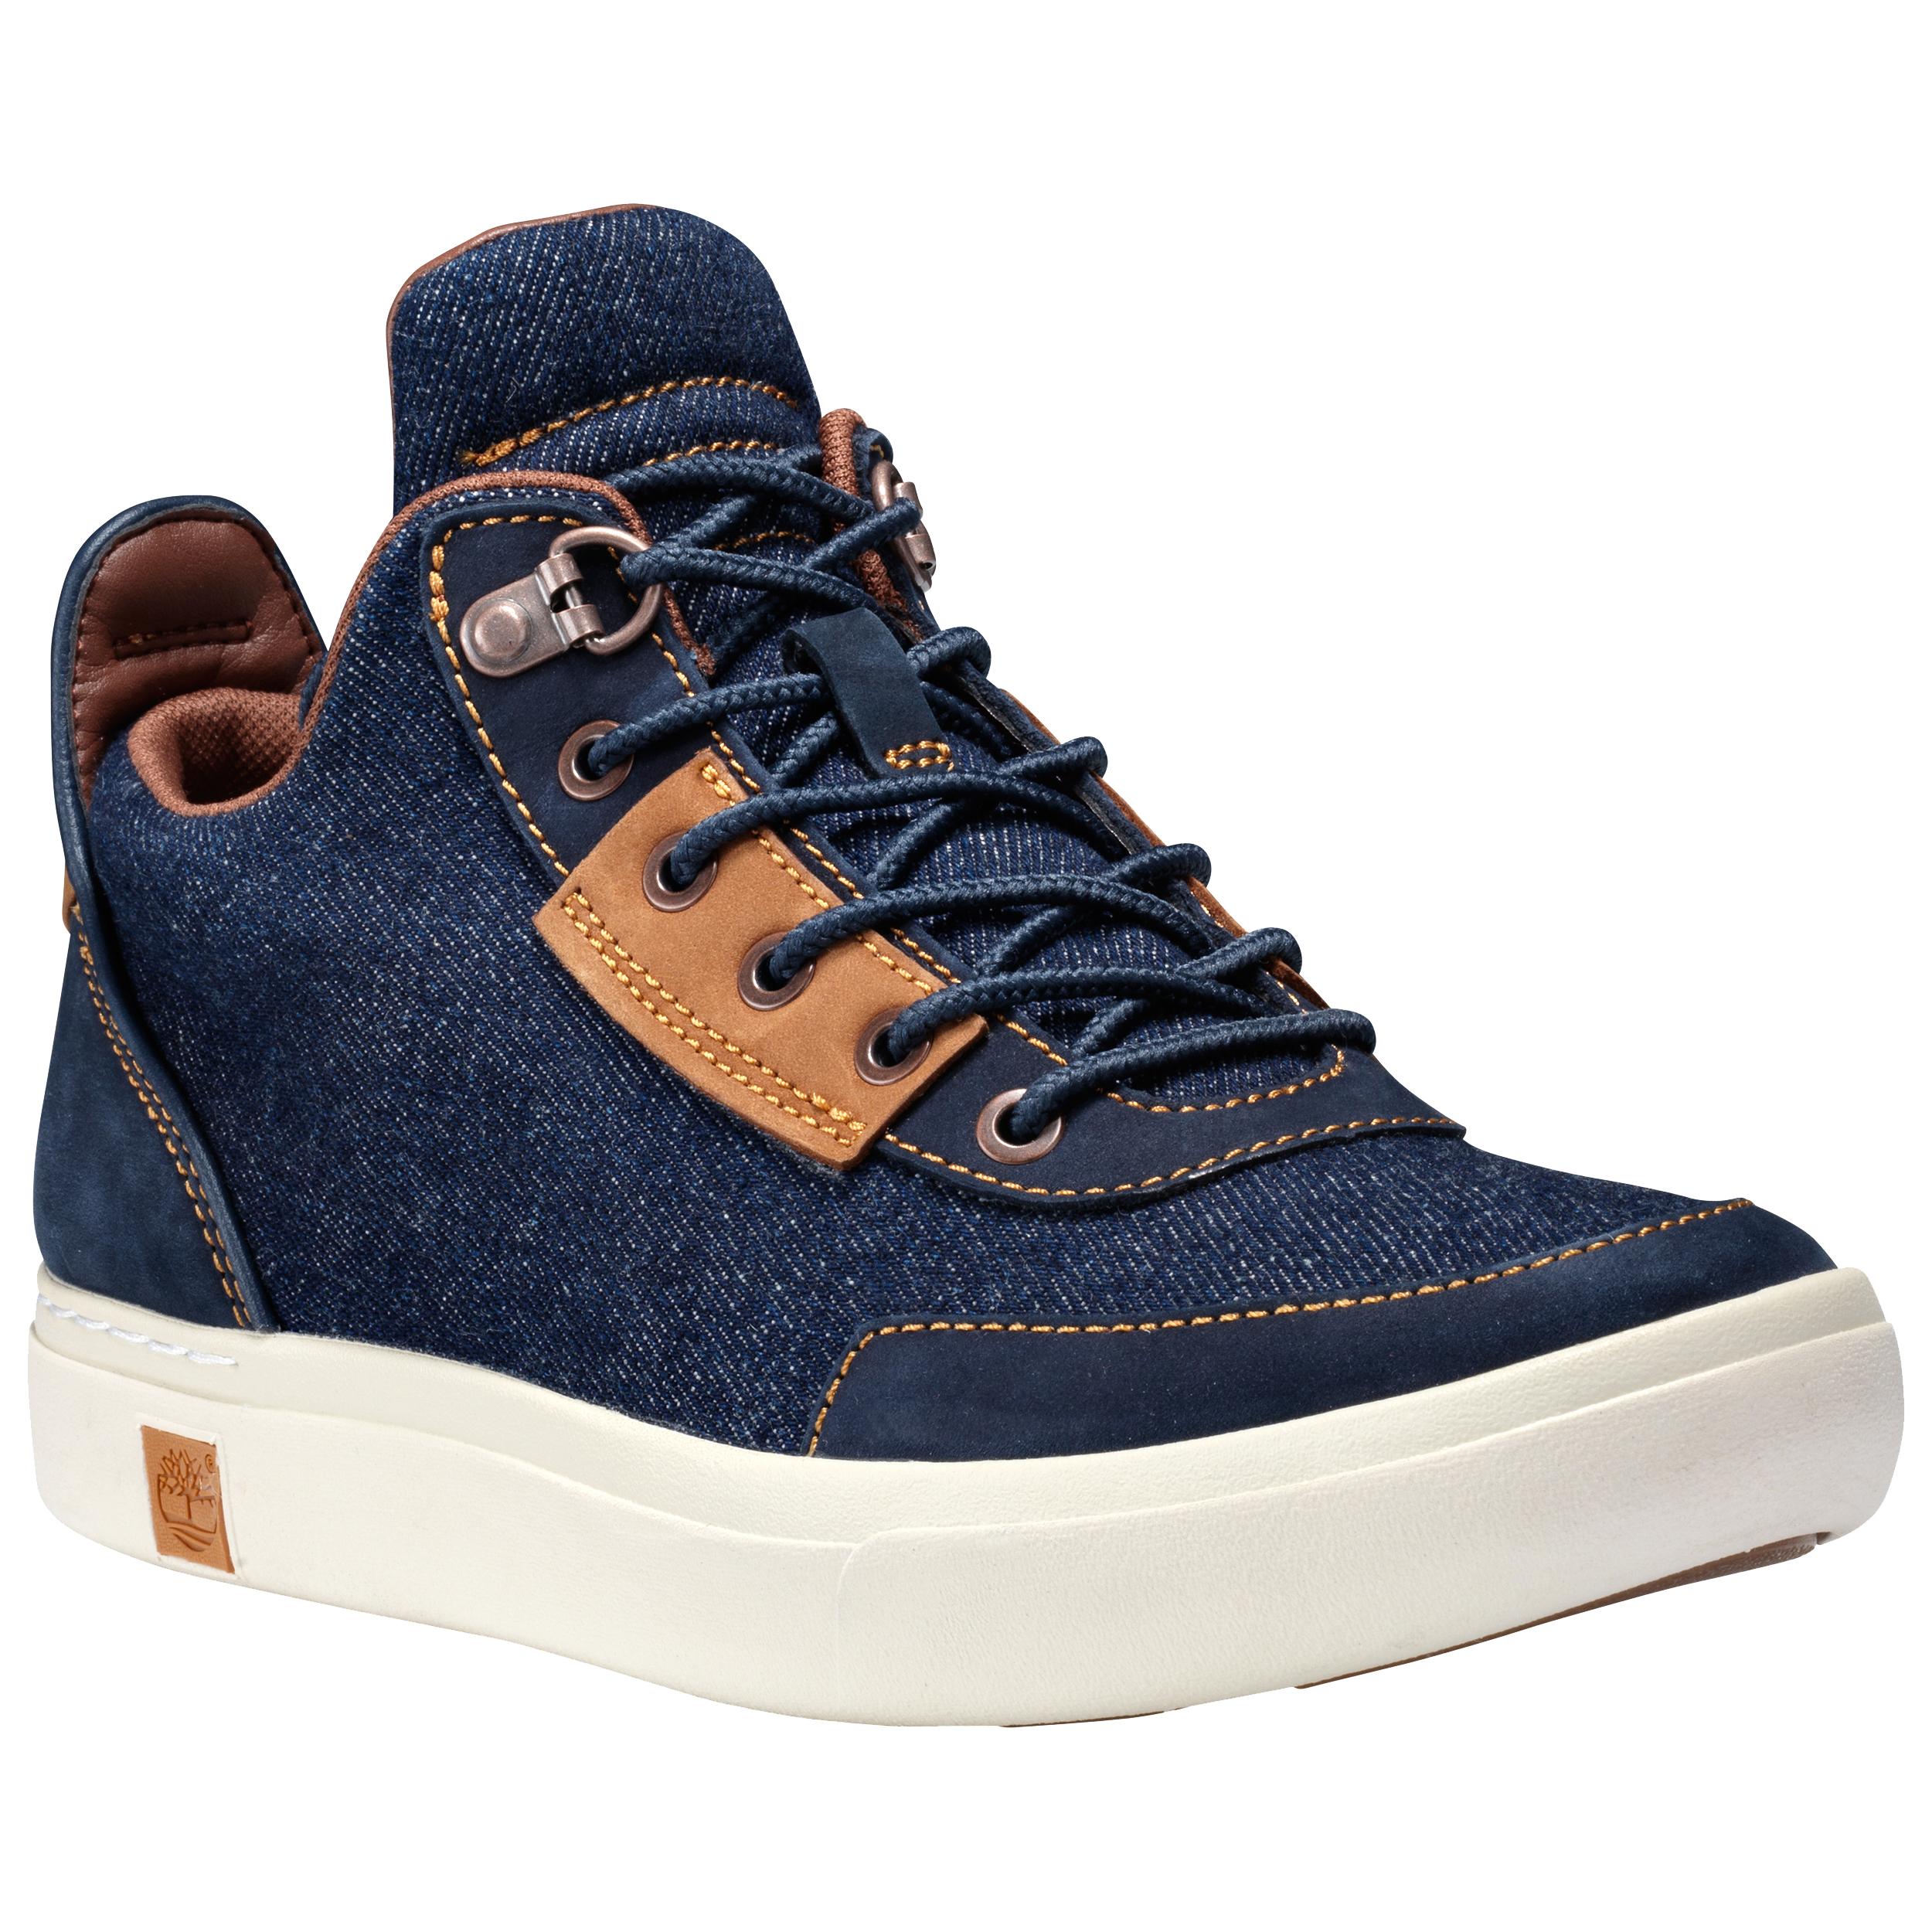 Timberland Amherst Canvas Chukka Shoes